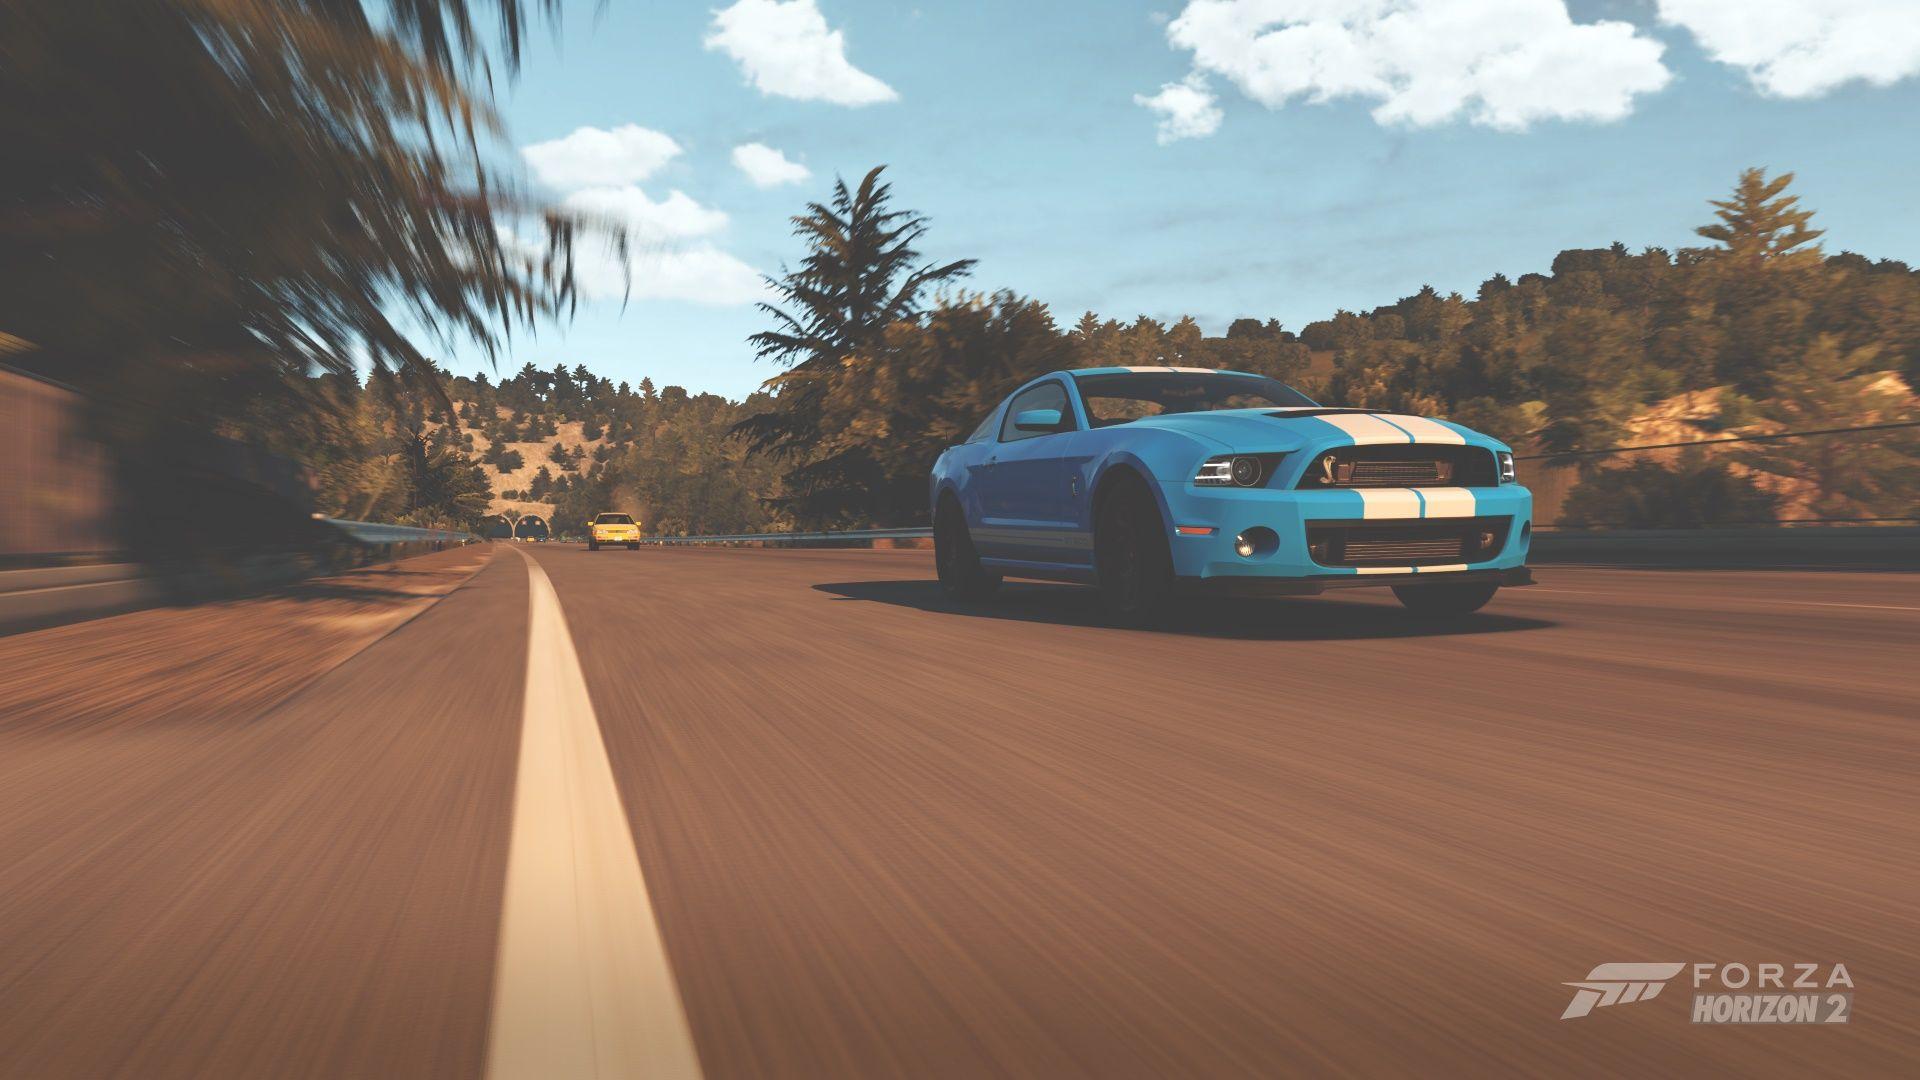 The Beauty Of Forza Horizon 2 Background Hd Wallpaper Hd